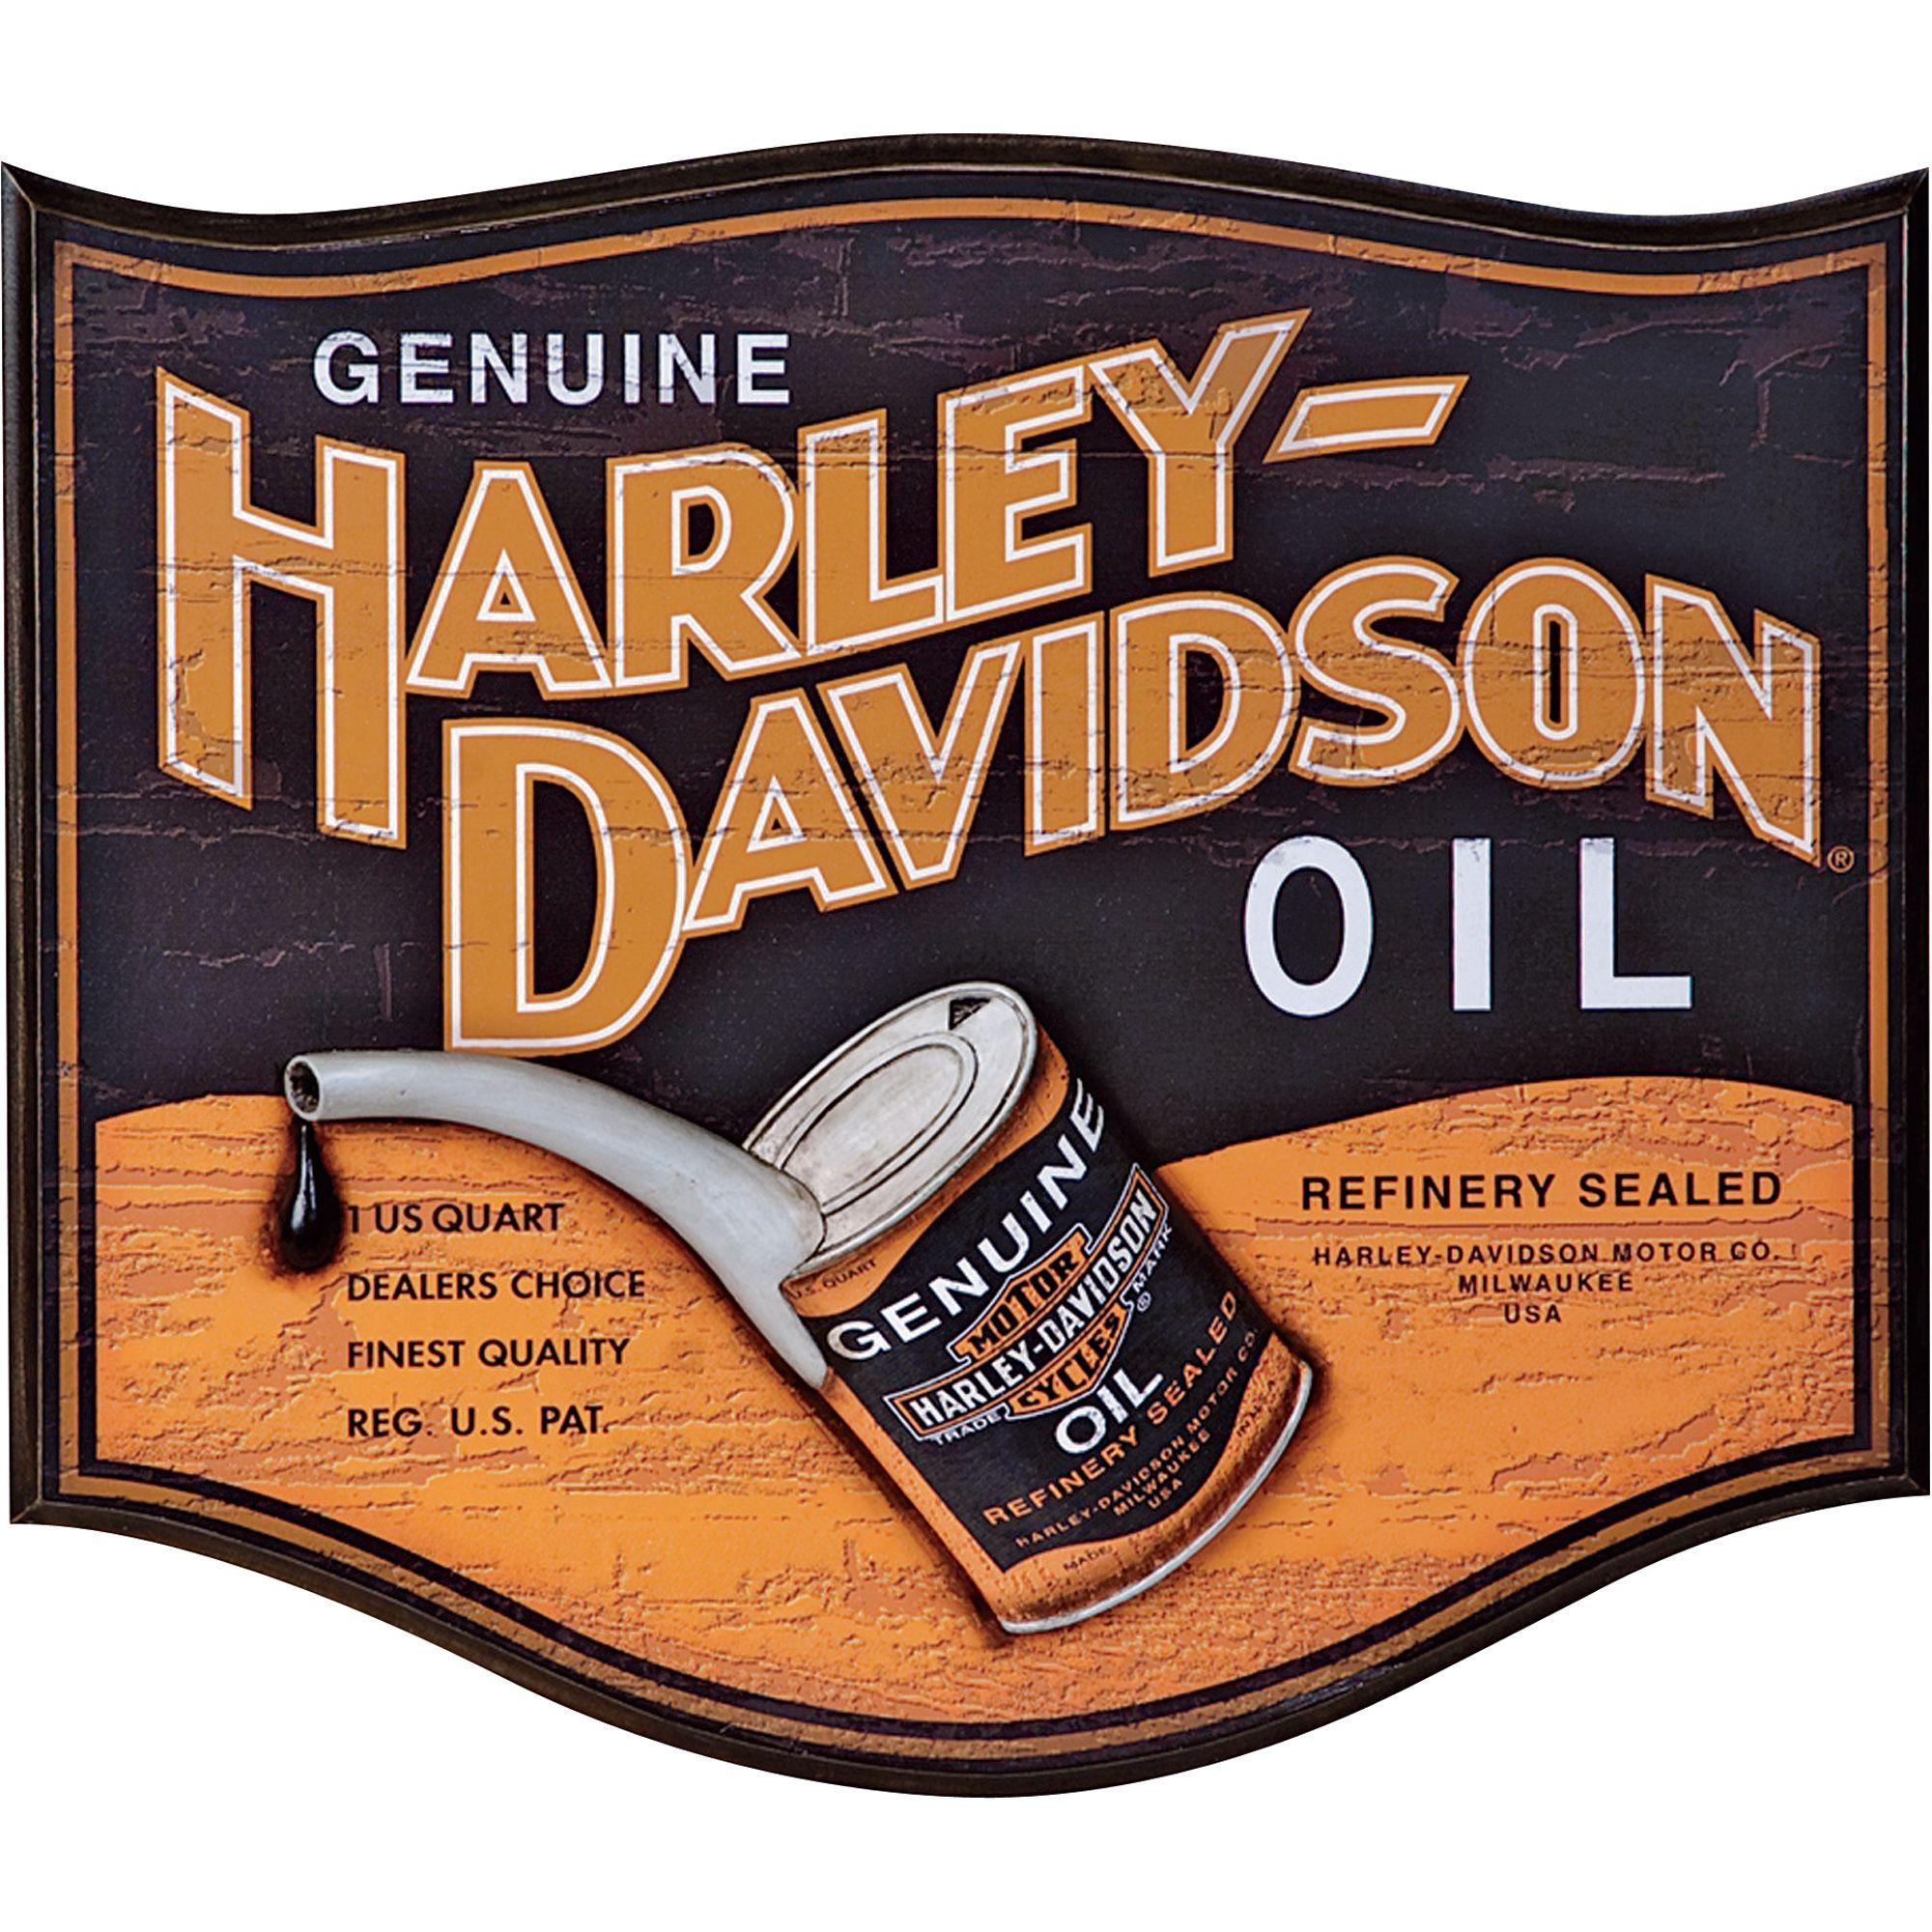 Harley Davidson Motorcycle Bar Shield Logo Neon Table Or: Vintage Harley Davidson Logo Images YOGkunS5W